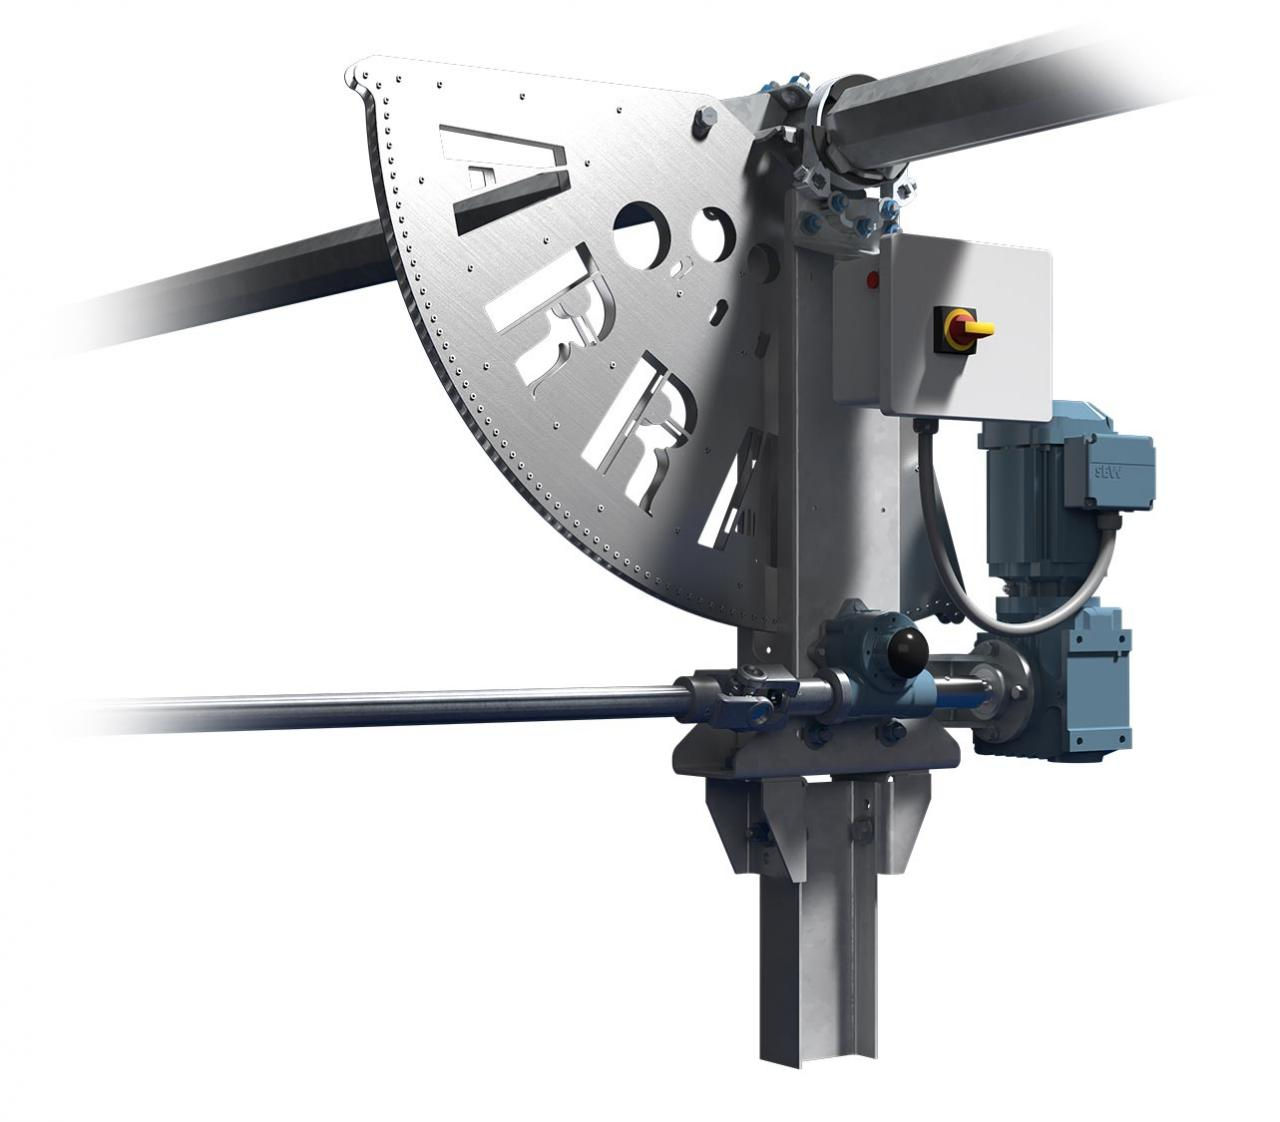 Array Technologies 获得高达4GW光伏跟踪器合同